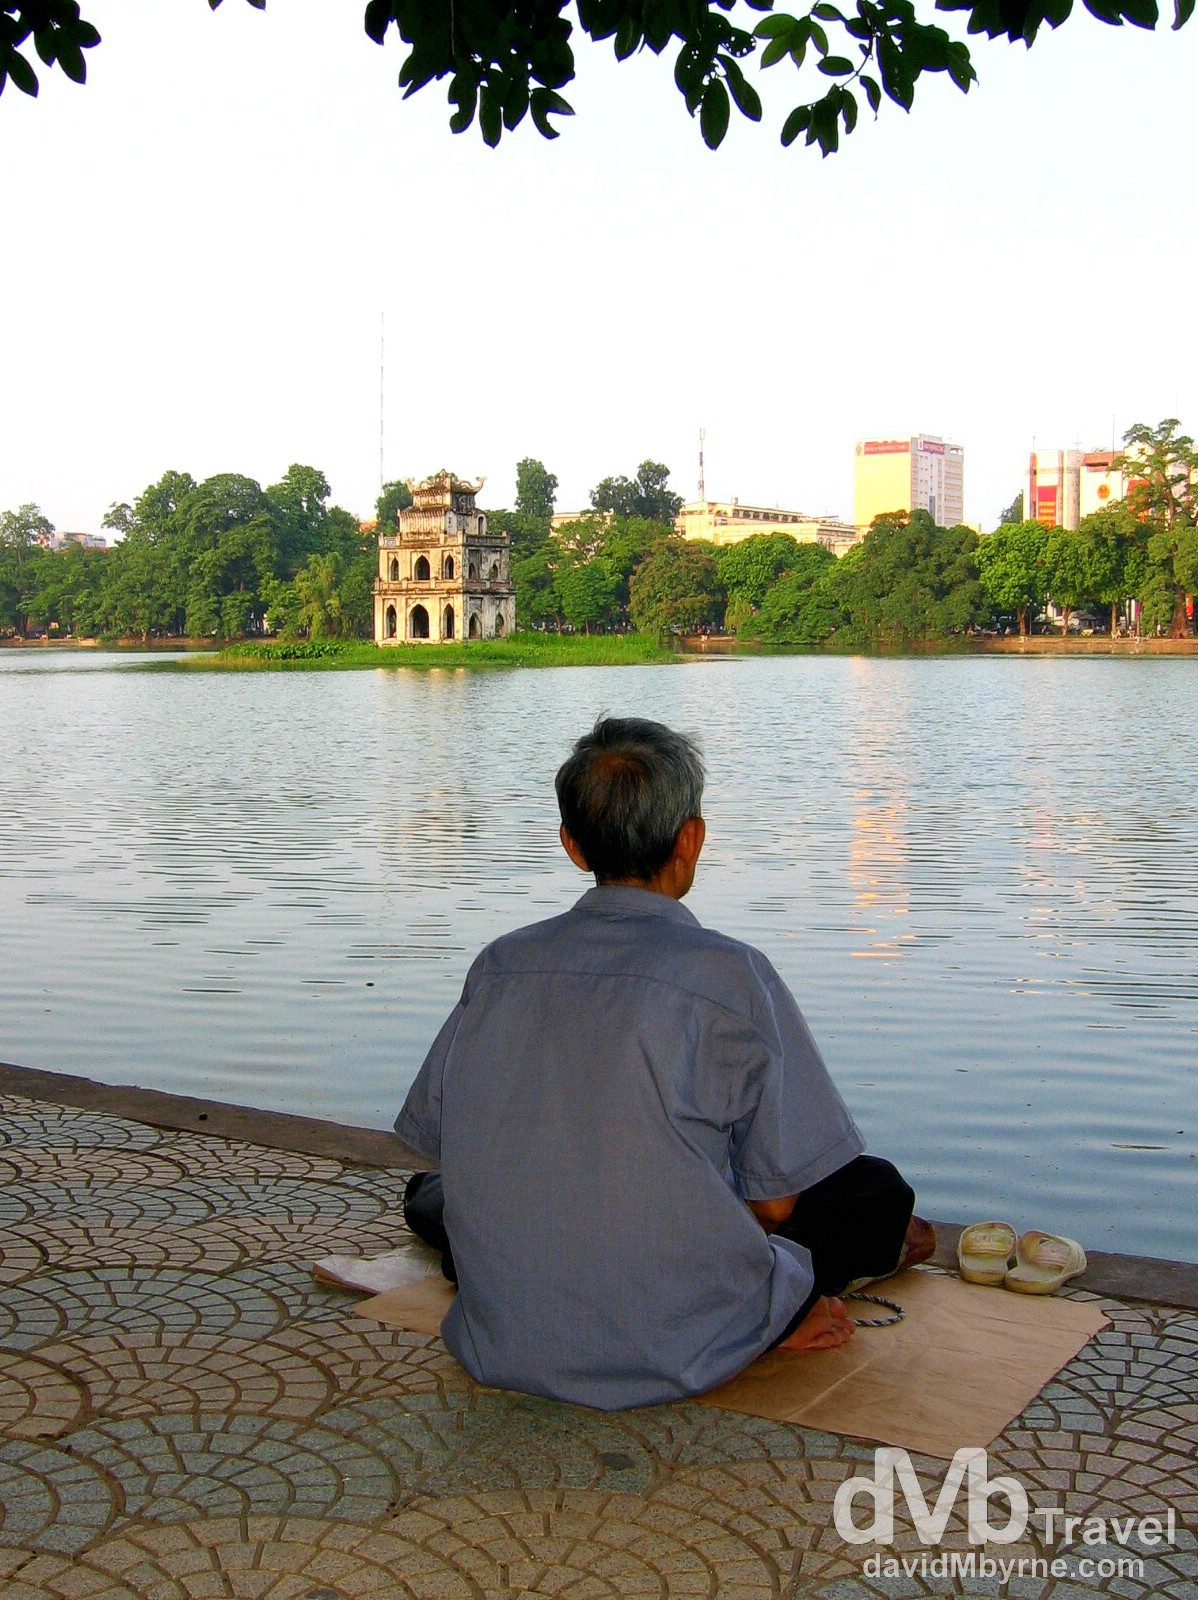 Sitting by the edge of Hoan Kiem Lake in Hanoi, Vietnam. September 5th, 2005.